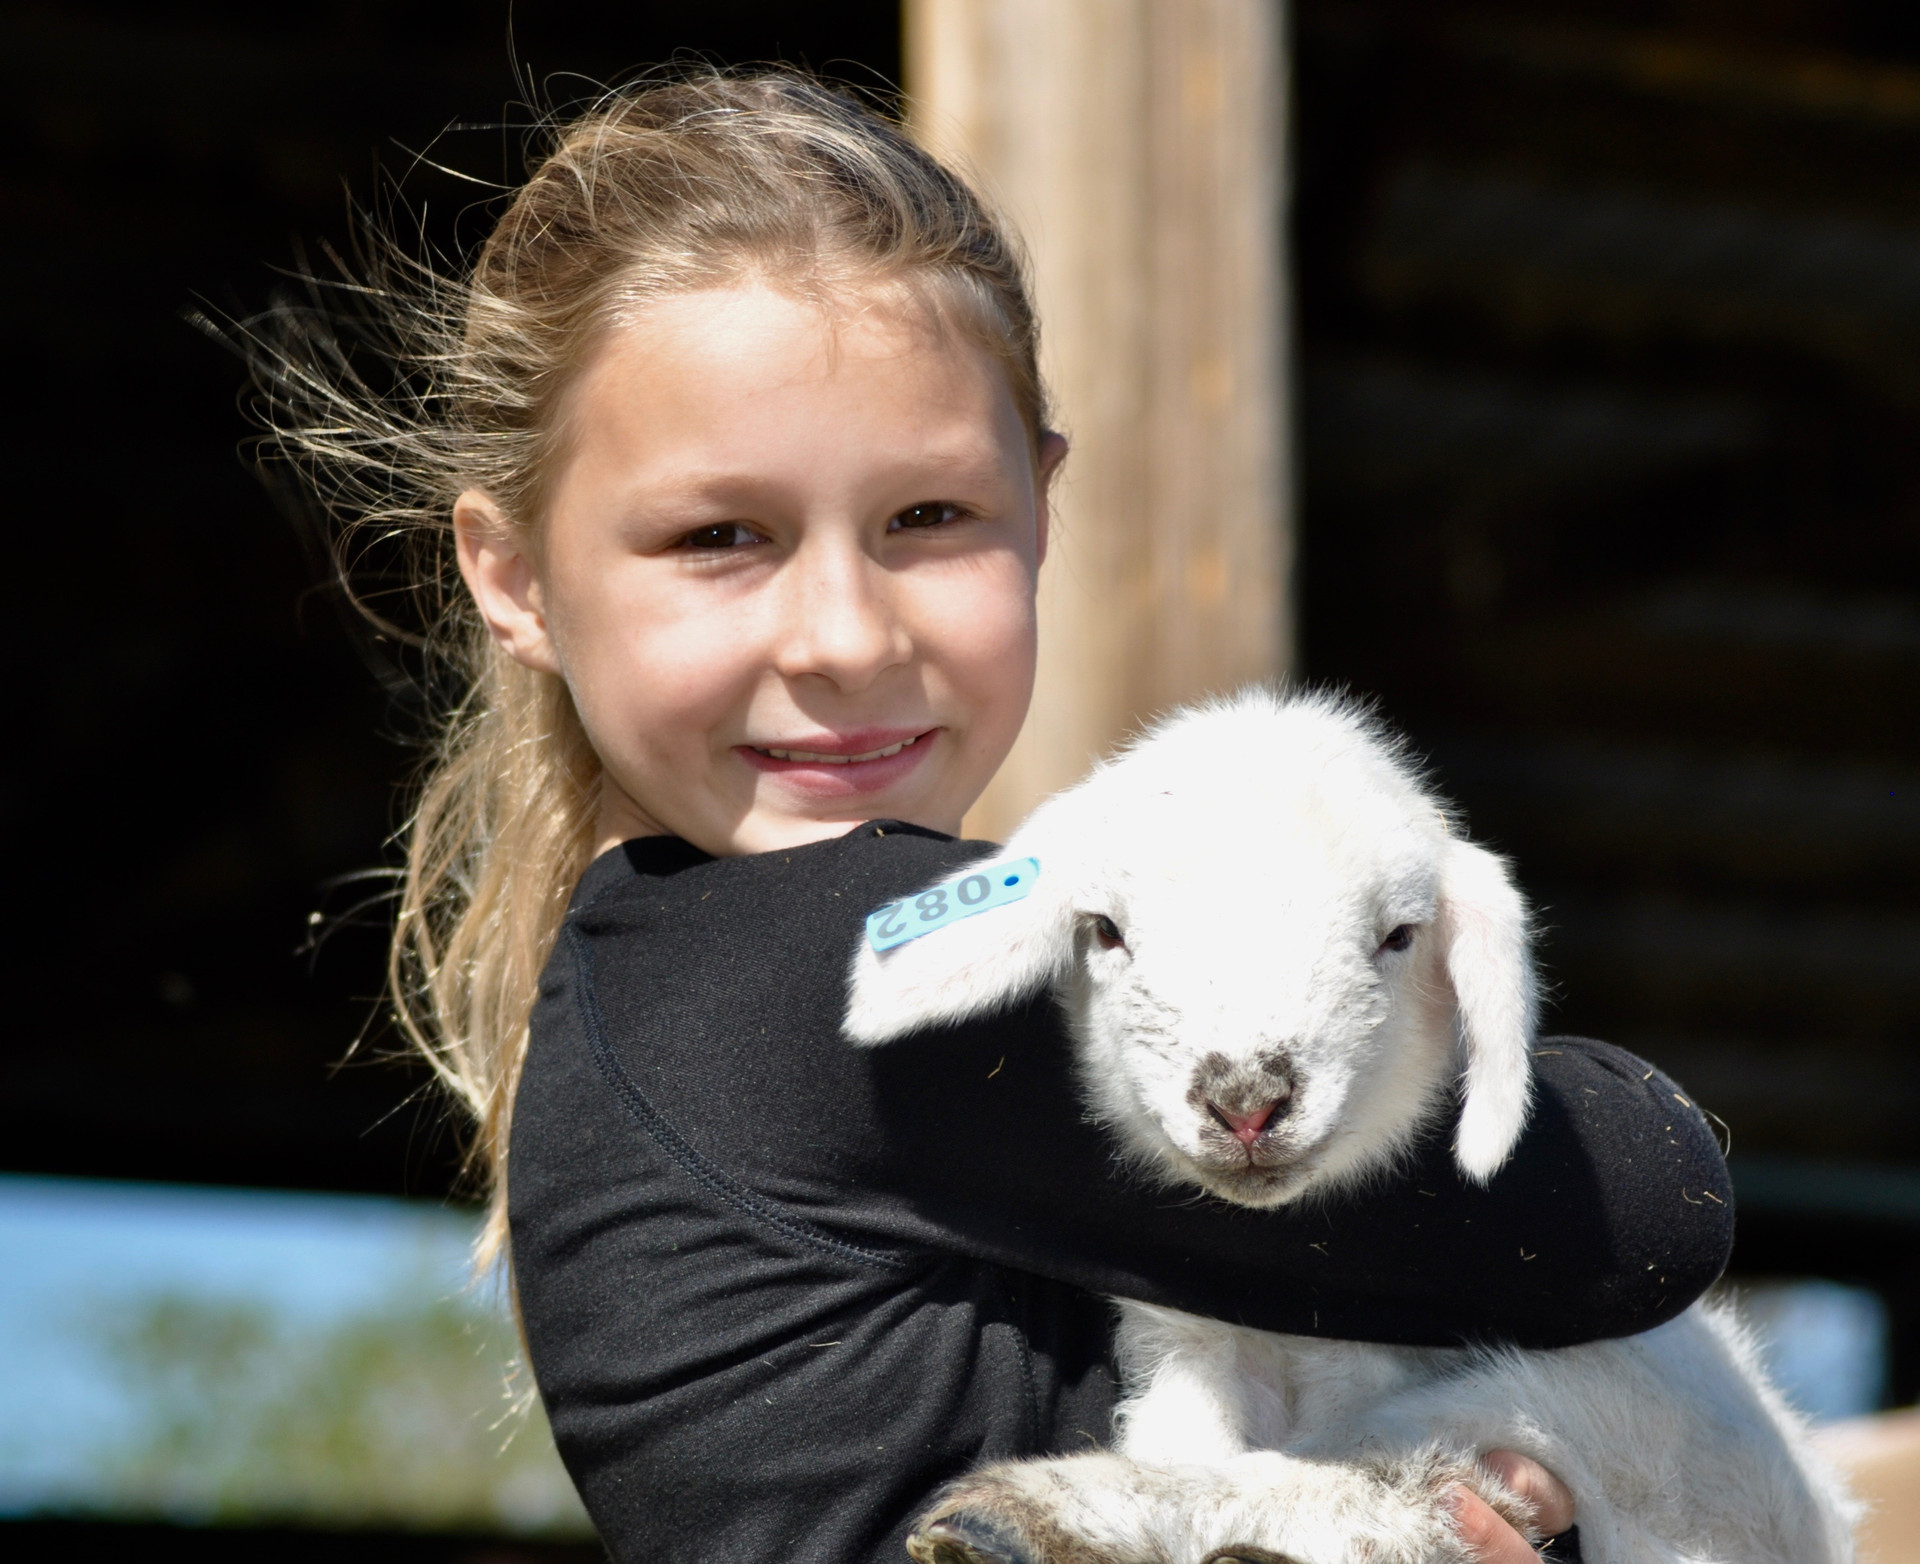 Harper had a little lamb